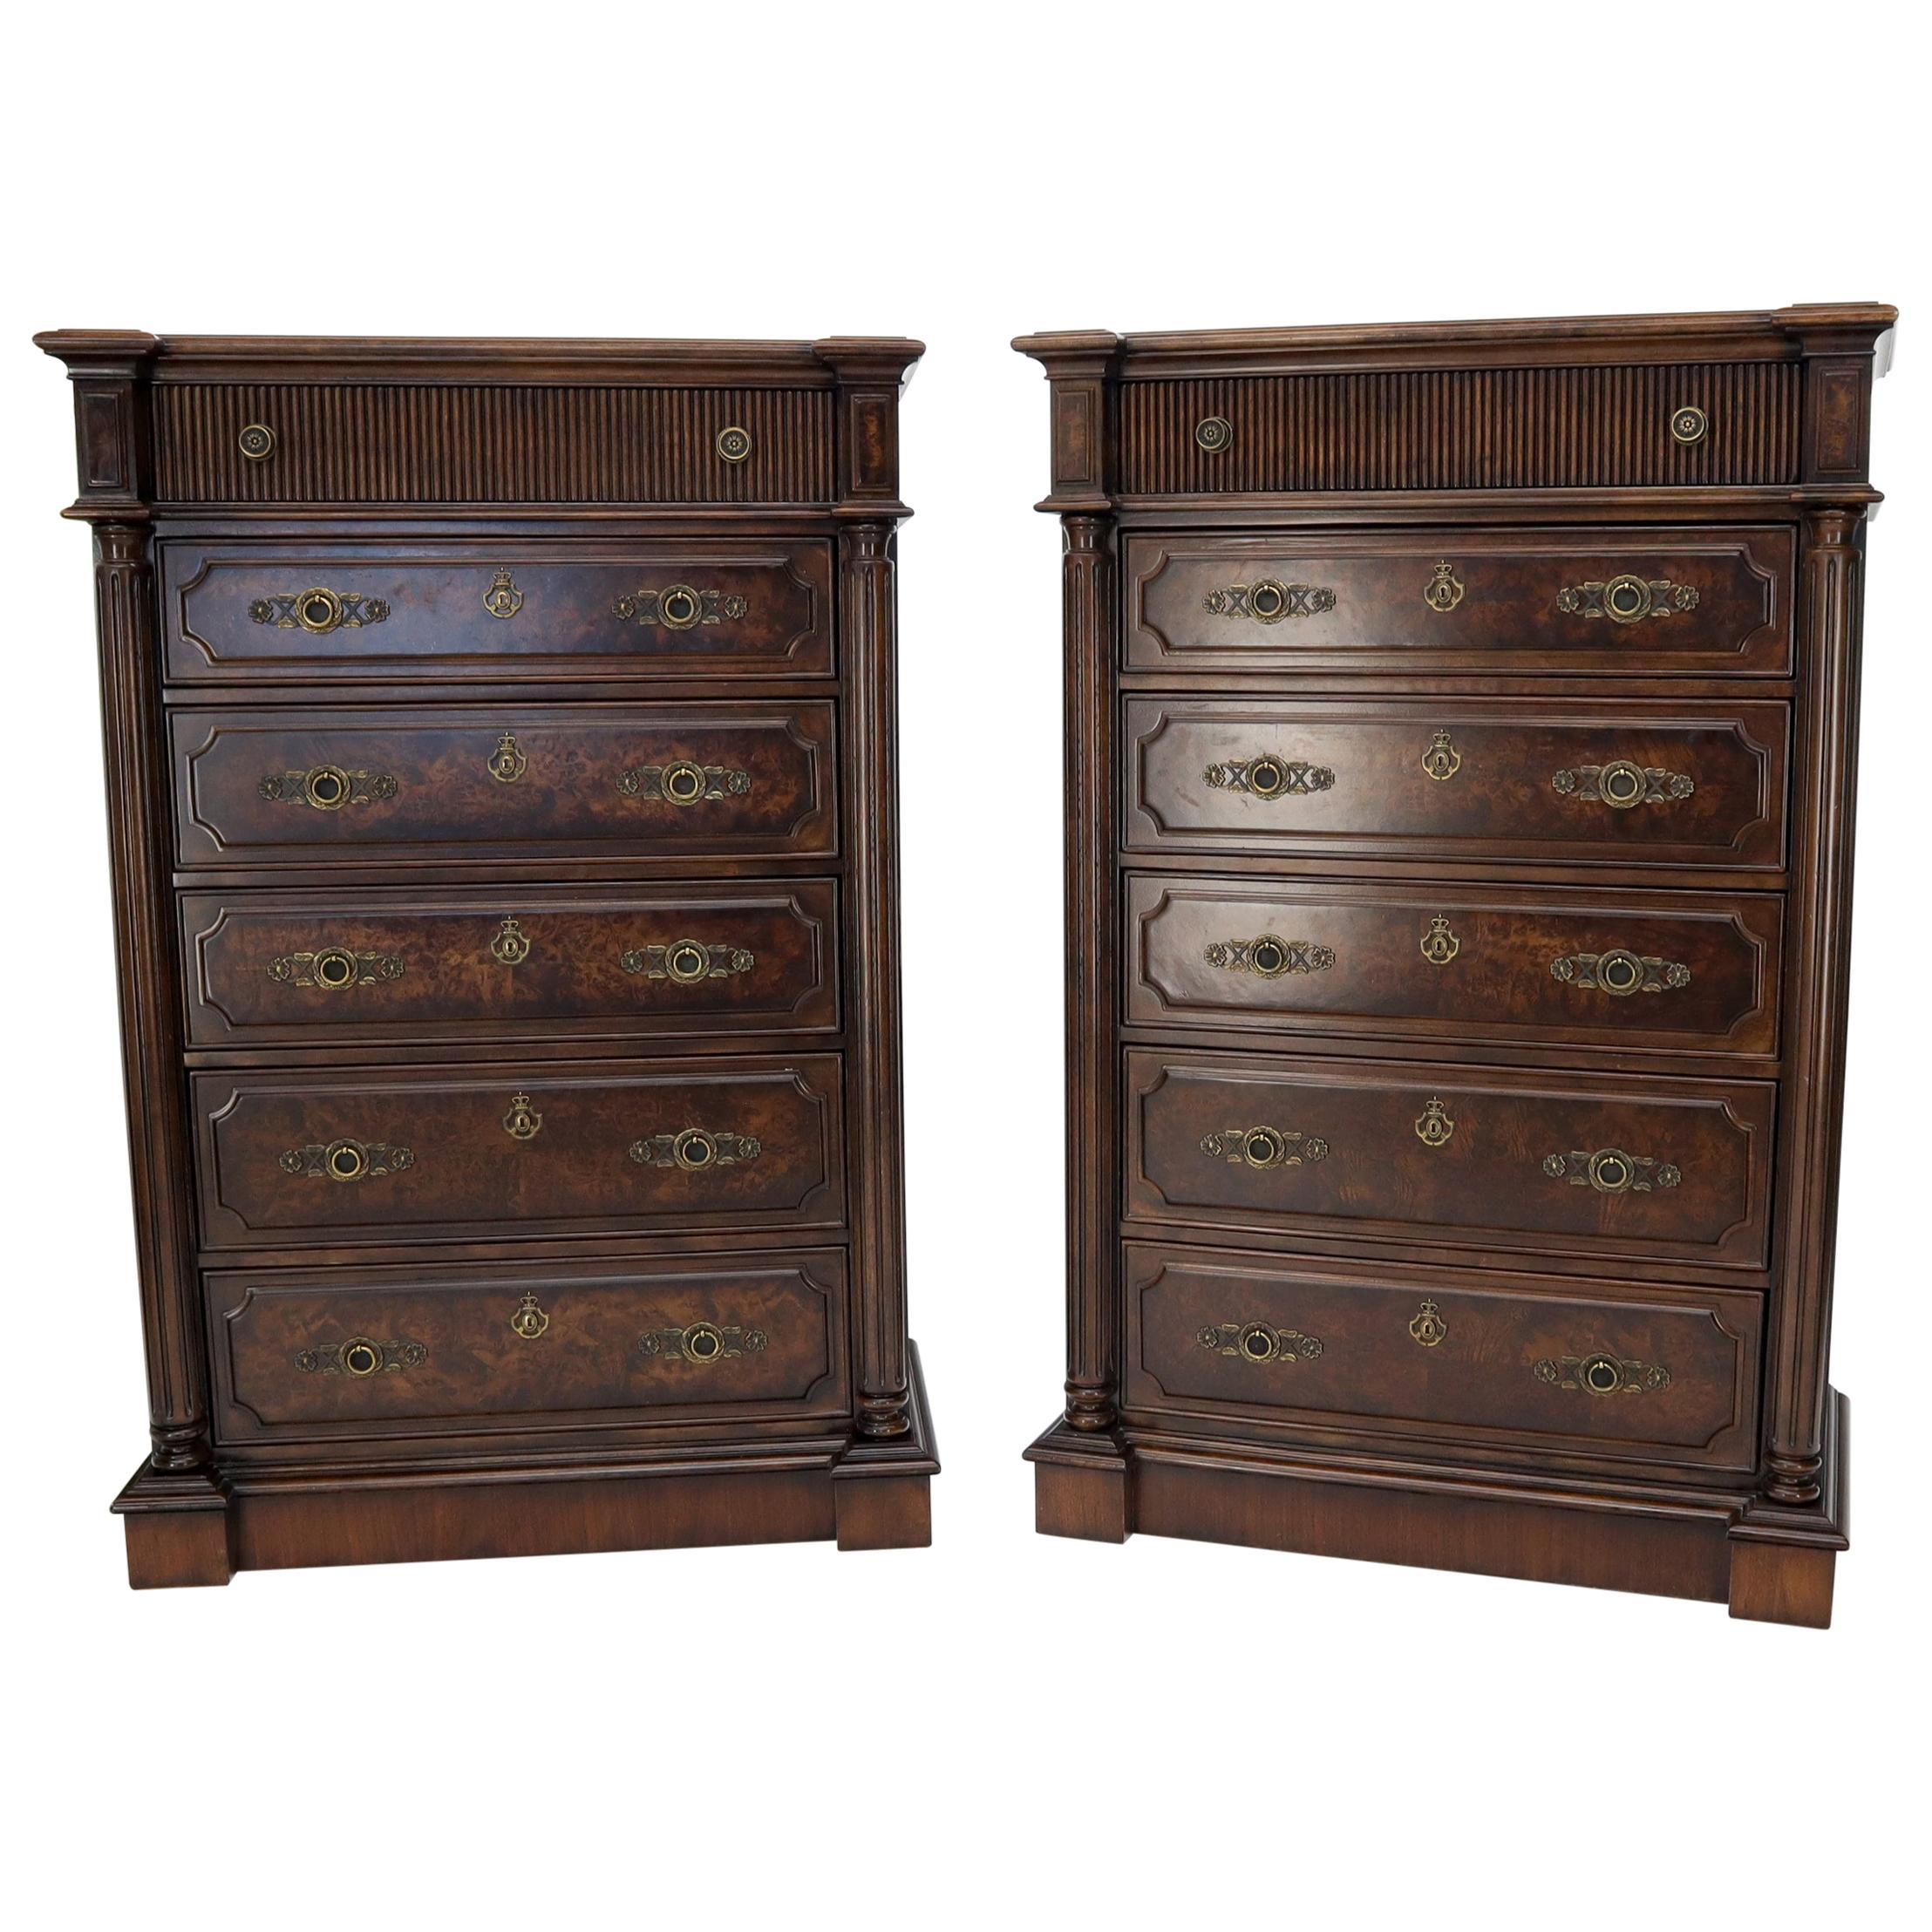 Pair of Tall 6 Drawers Burl Wood Dressers